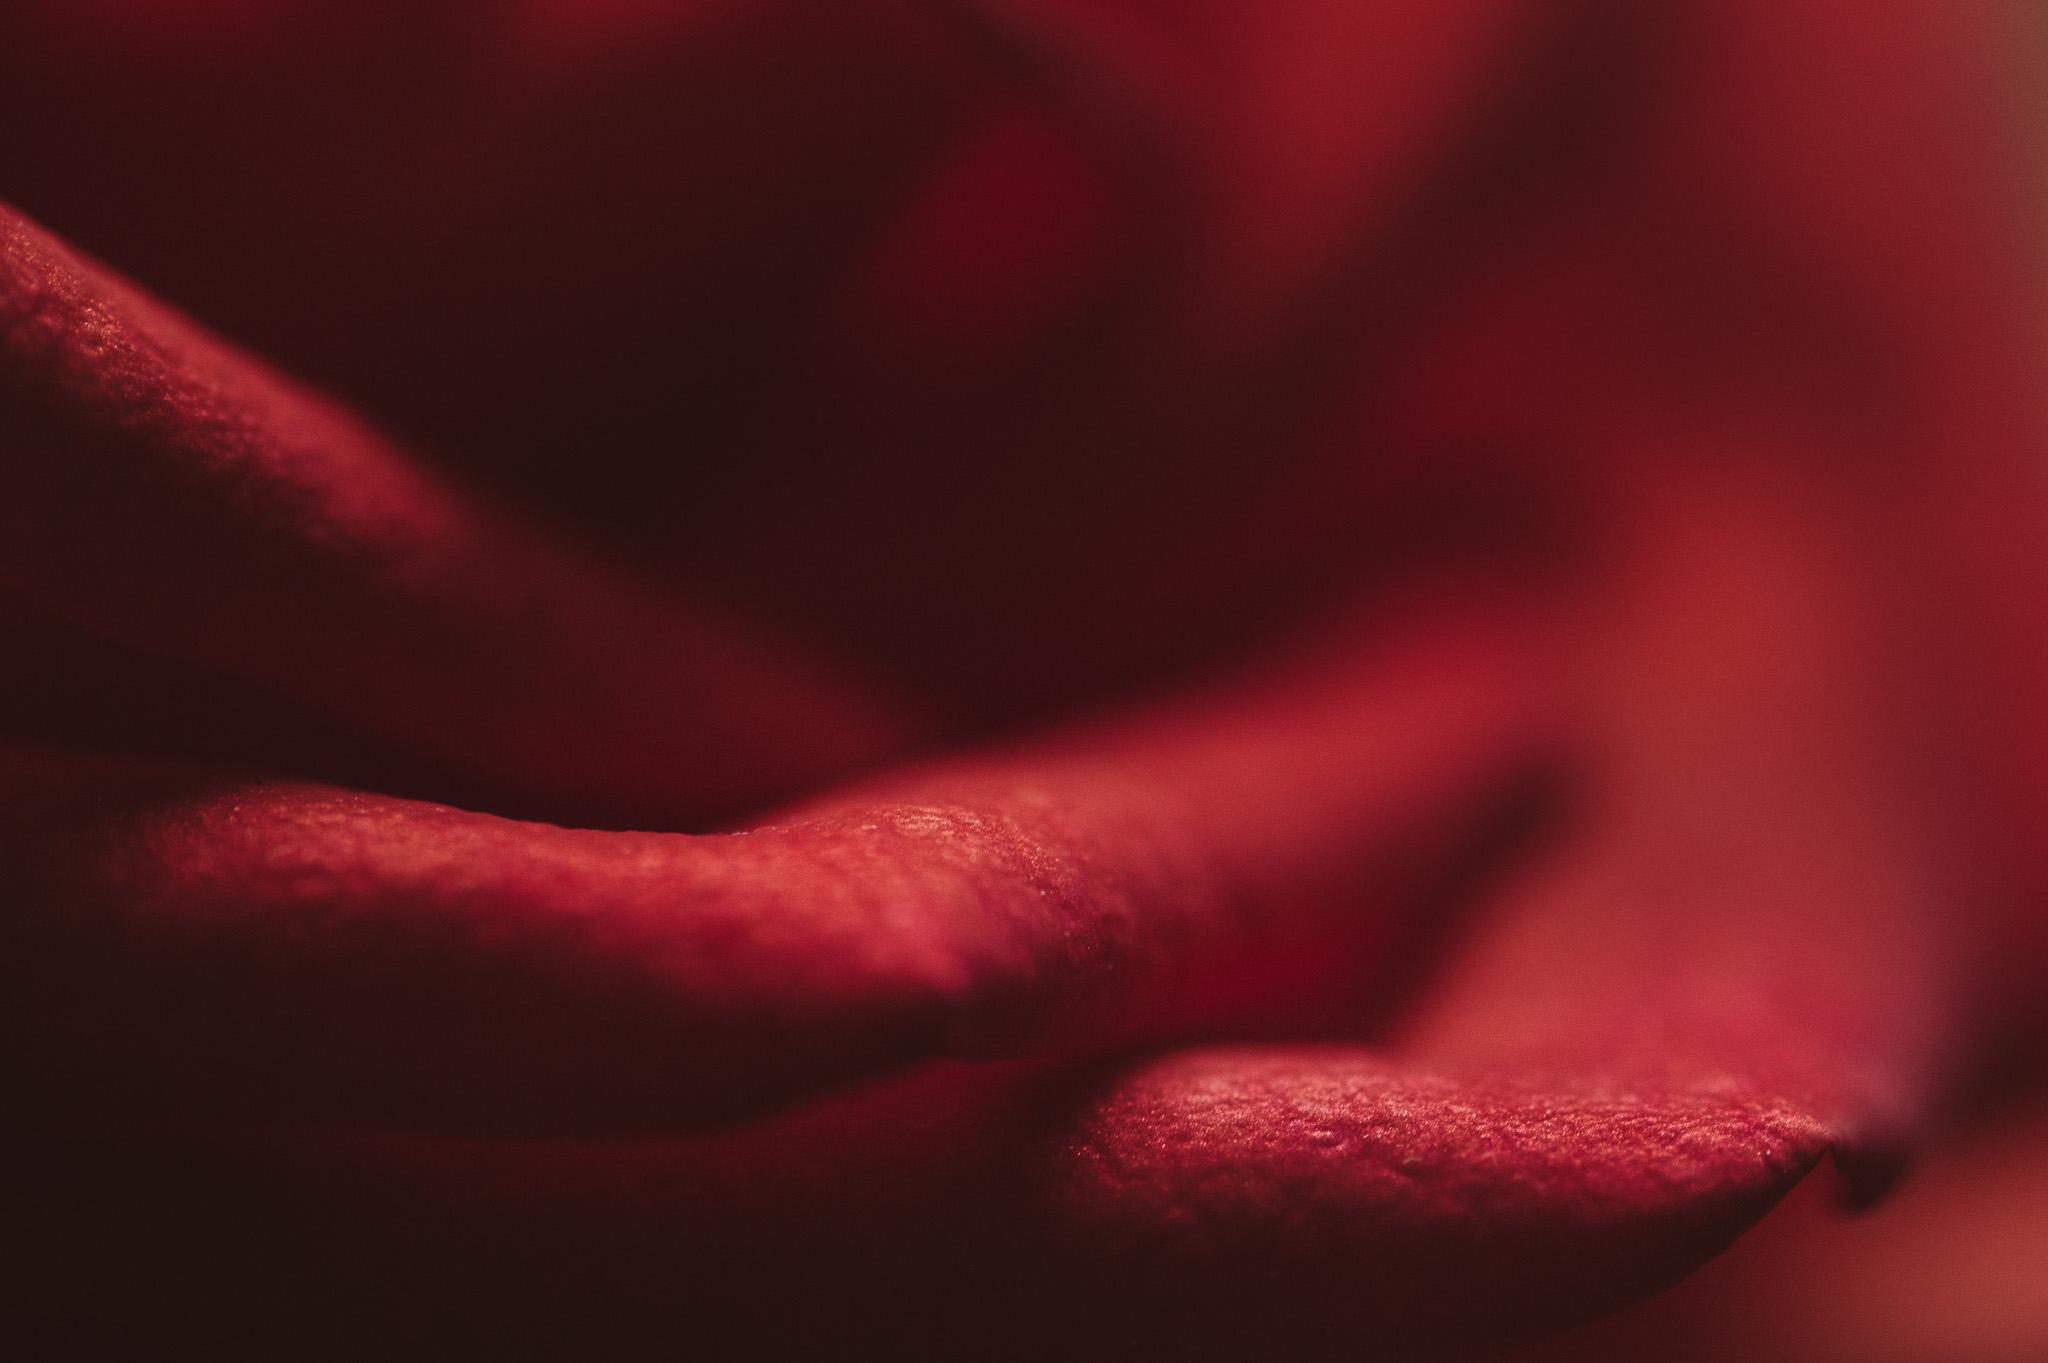 macro photo of red flower by Ebony Logins